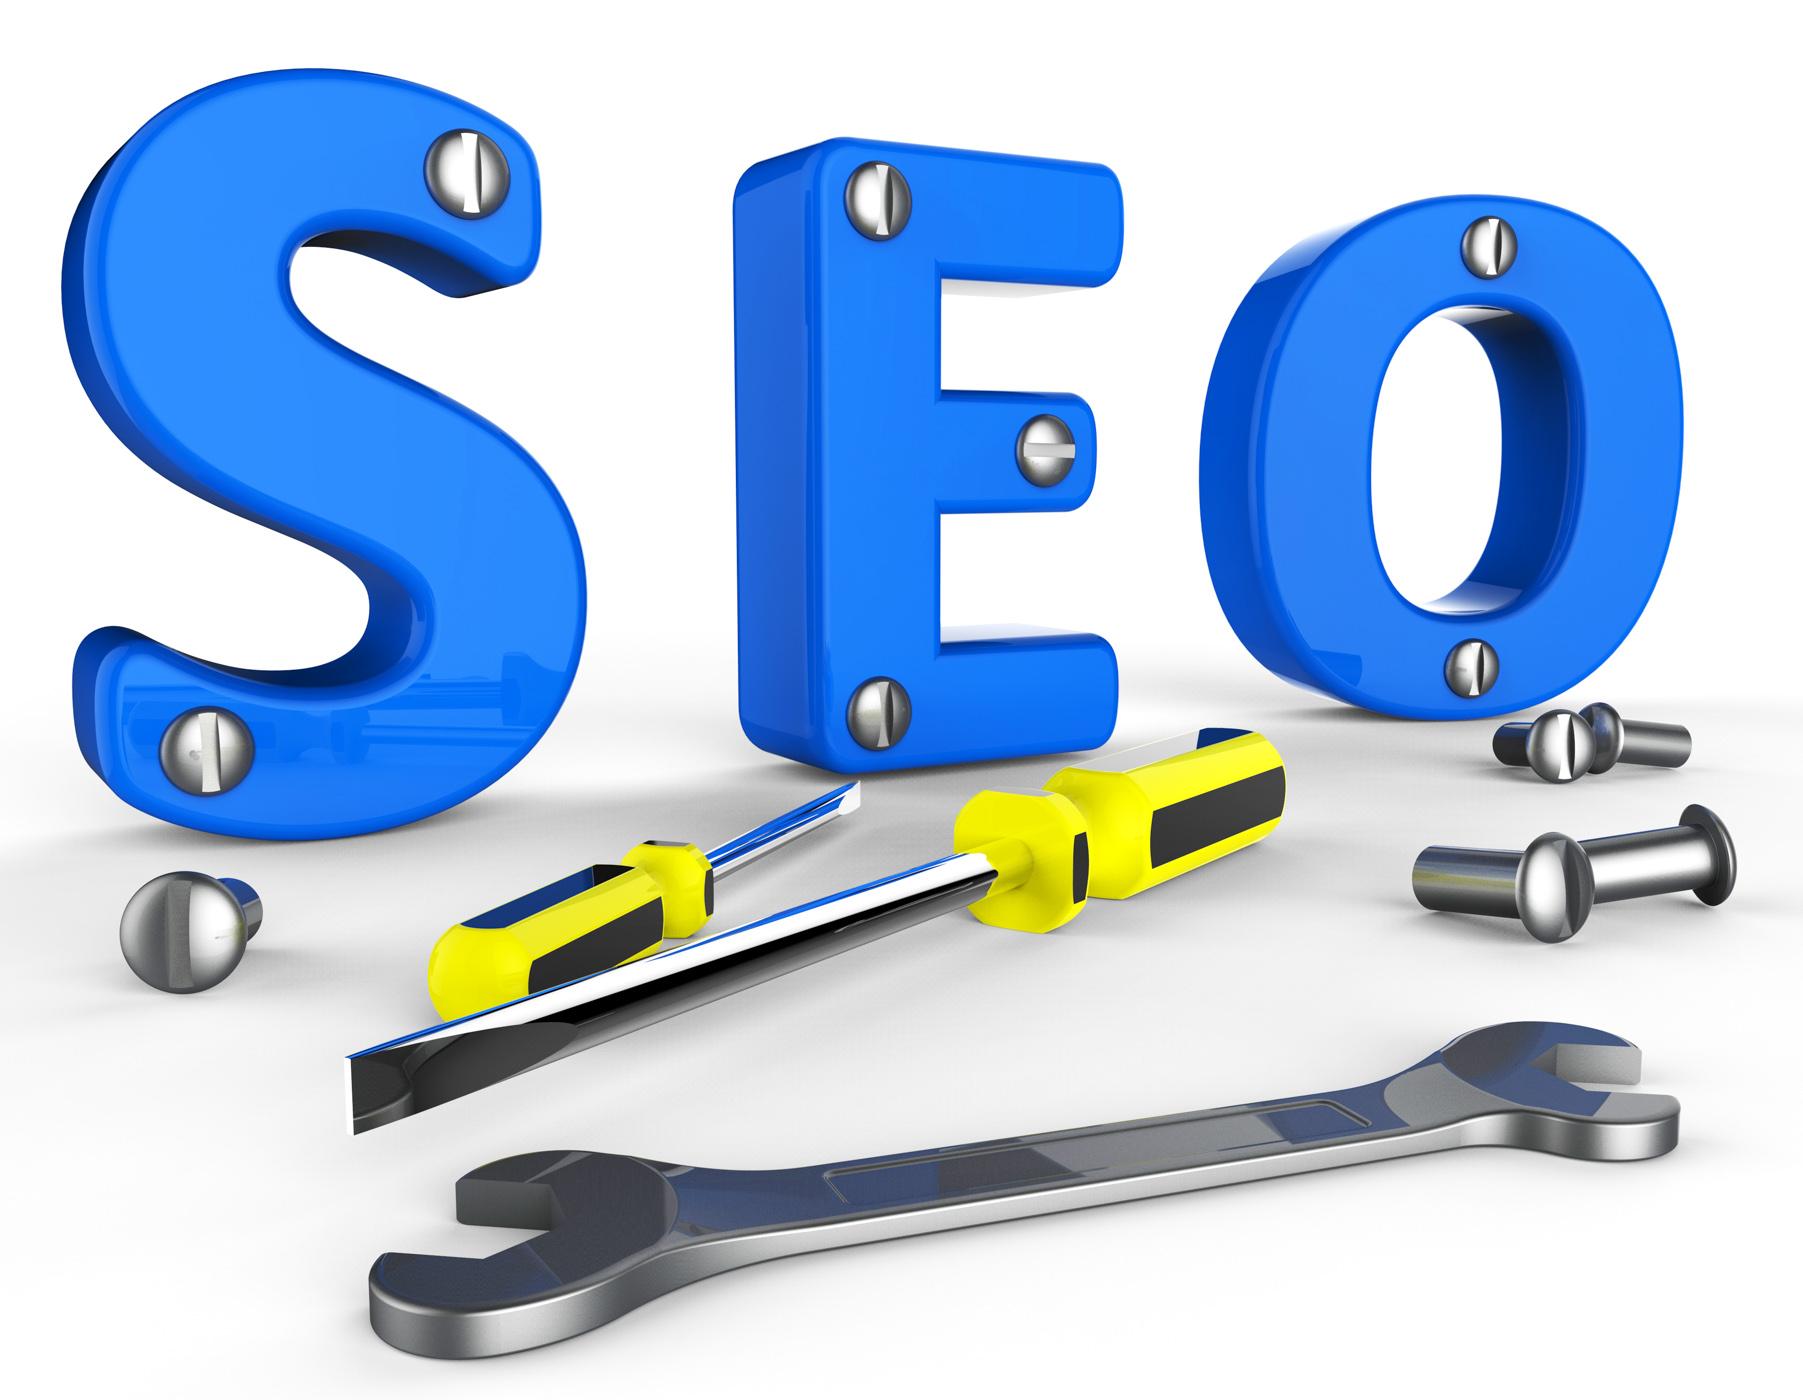 Search engine optimization indicates gathering data and information photo